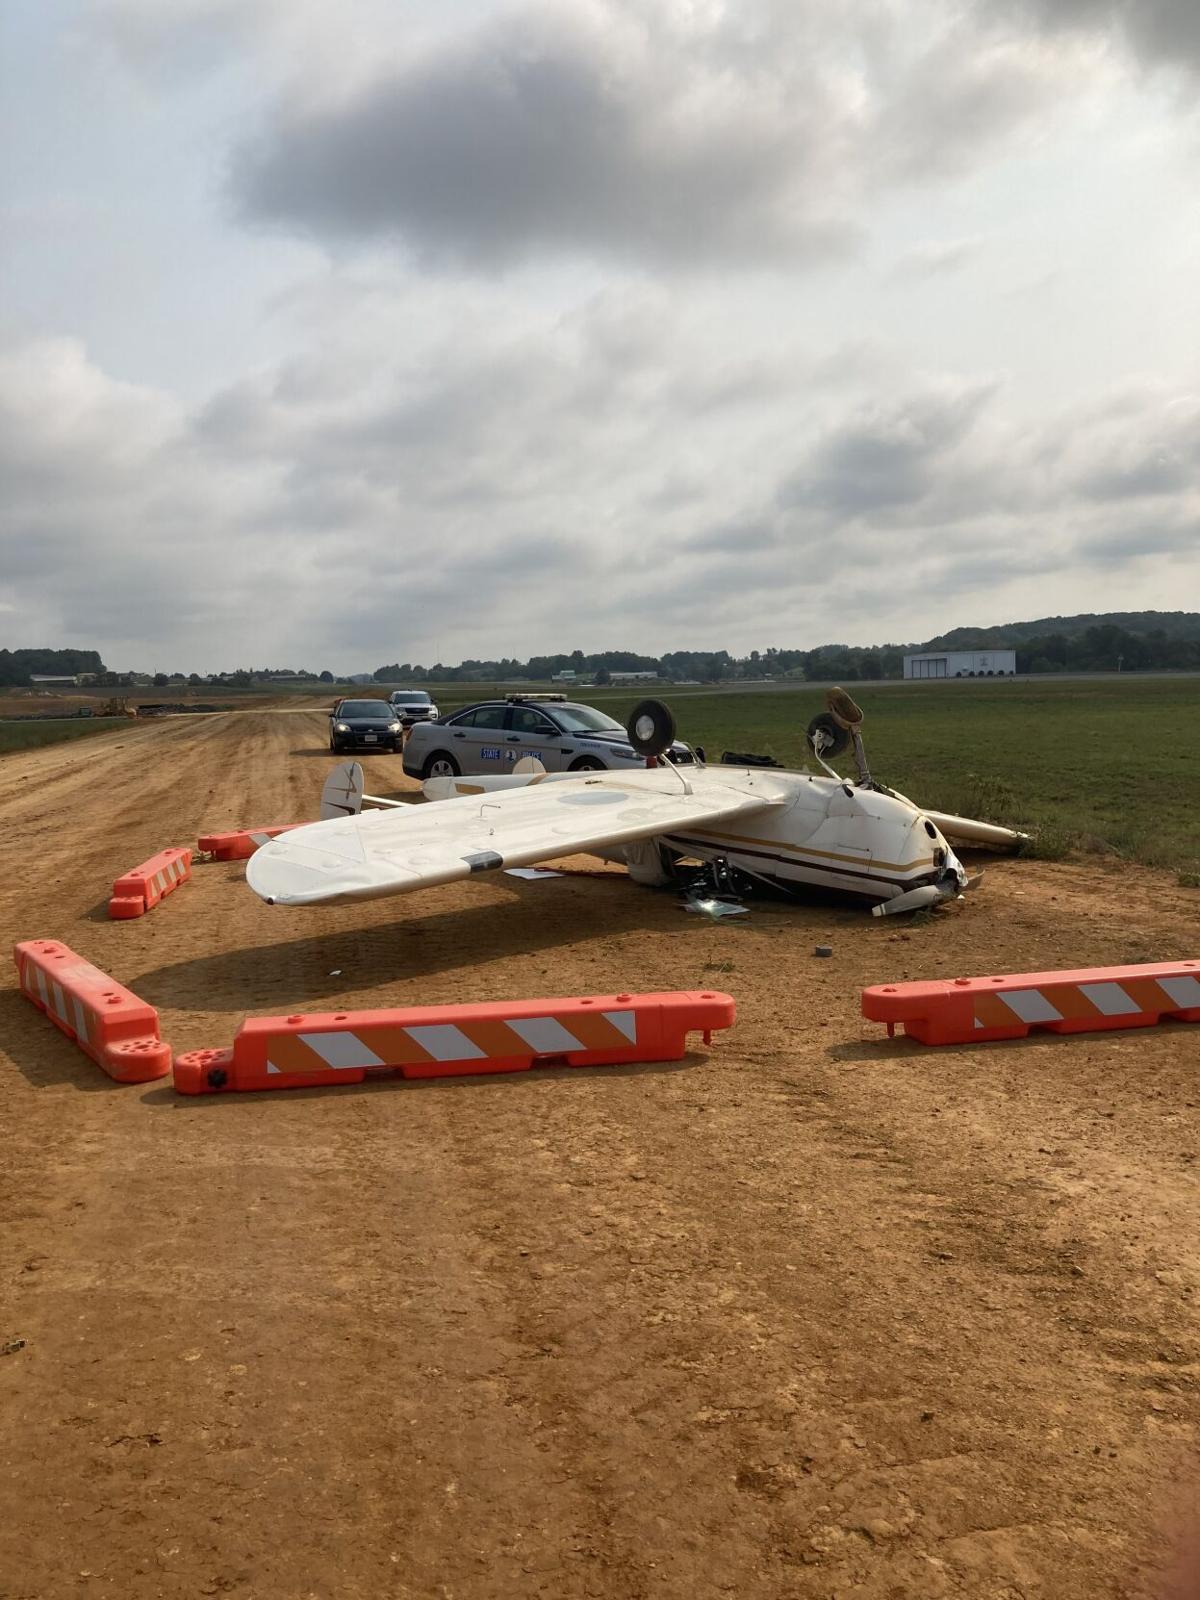 Virginia Highlands Airport